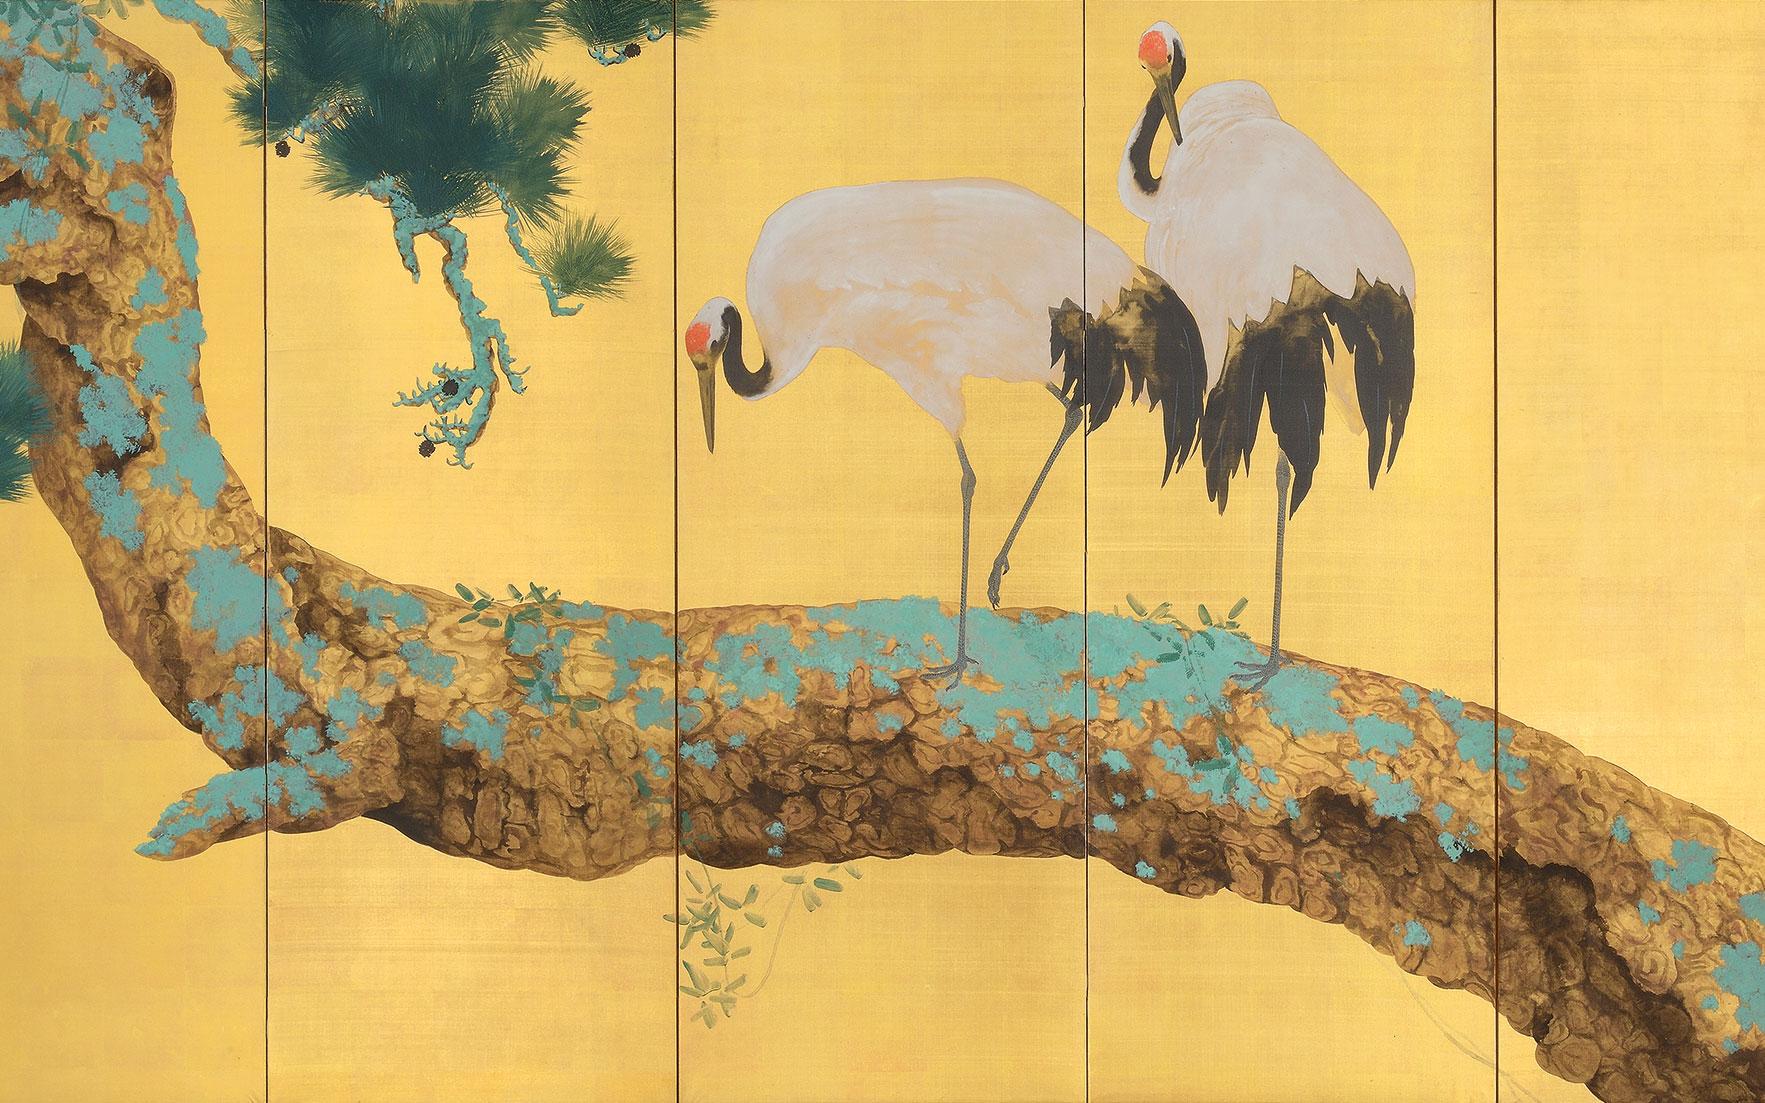 Asian Wood Wall Art - Elitflat